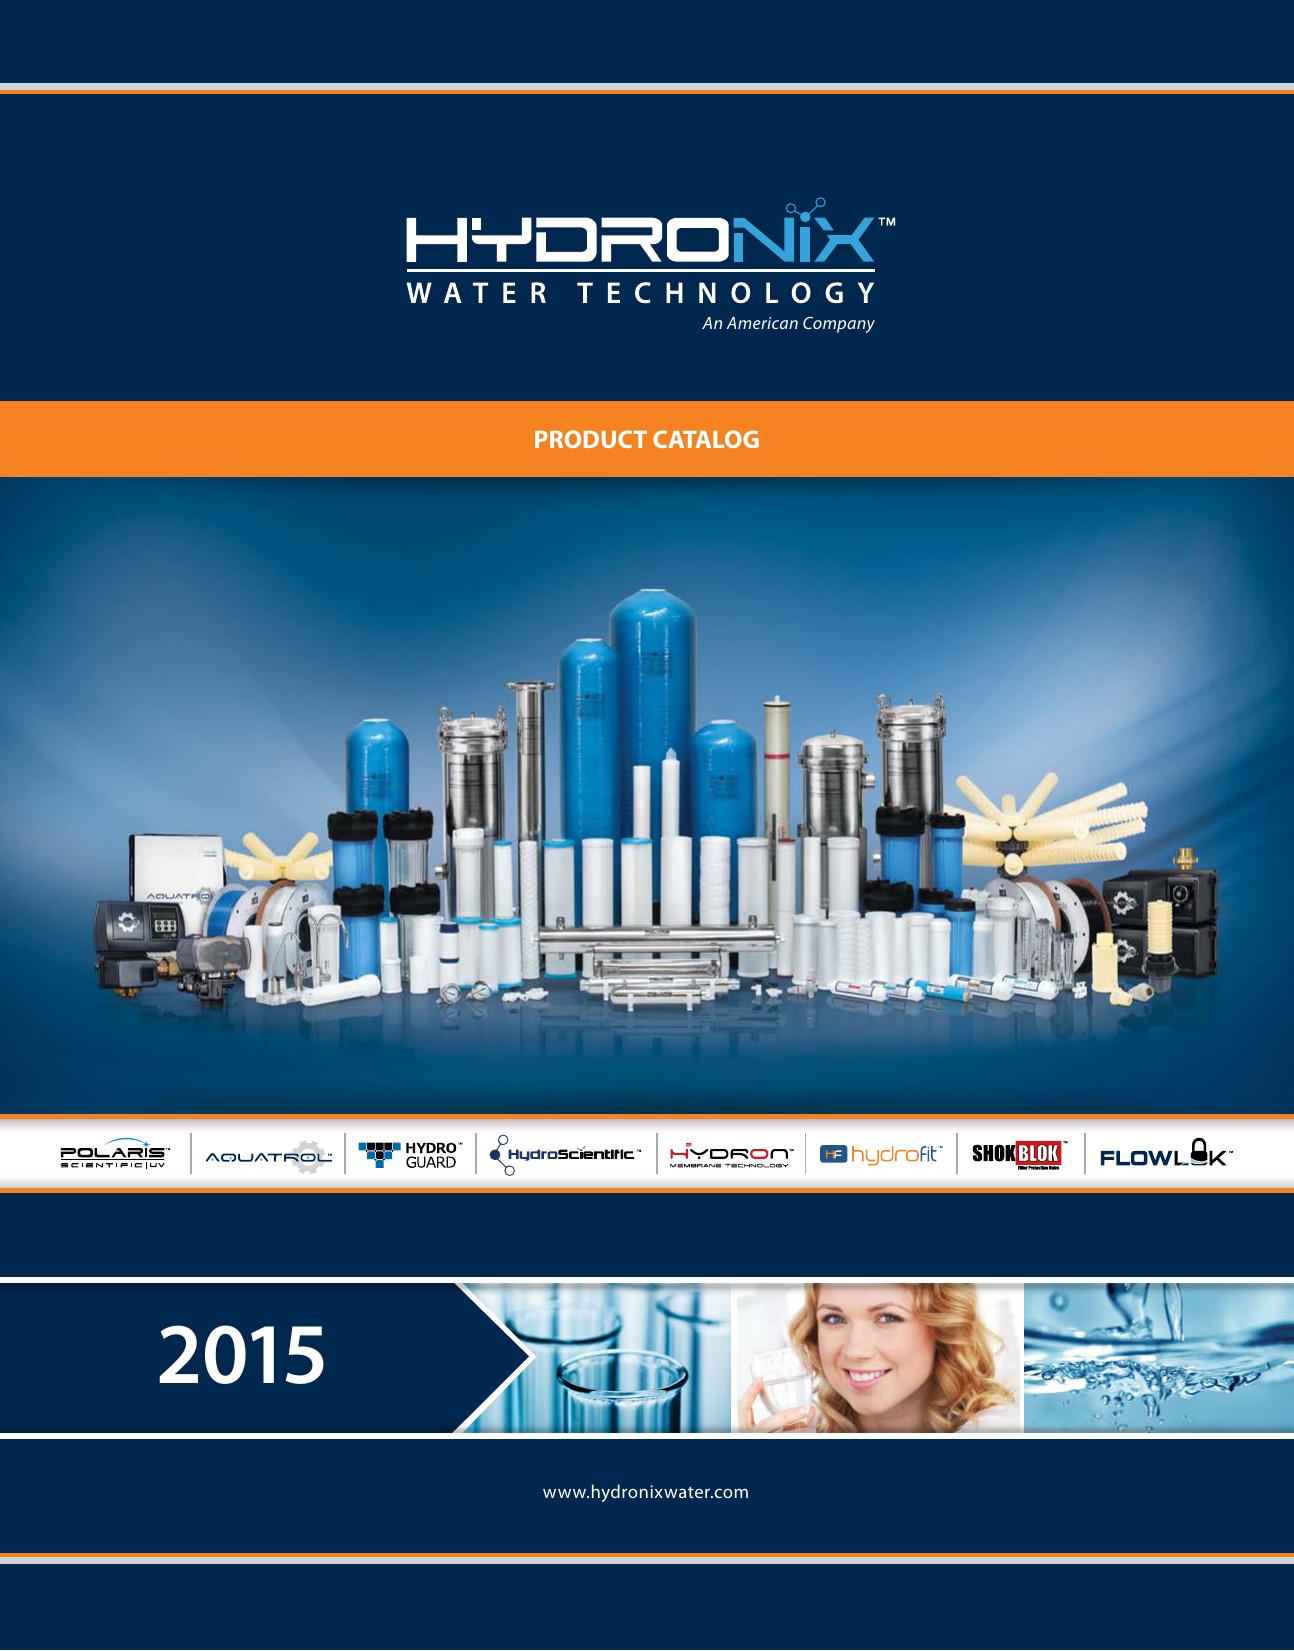 Hydronix ICF-2512 Inline Coconut Filter 2.5 OD X 12 Length 3500 Gal 1//4 FNPT 2.5 OD X 12 Length 1//4 FNPT